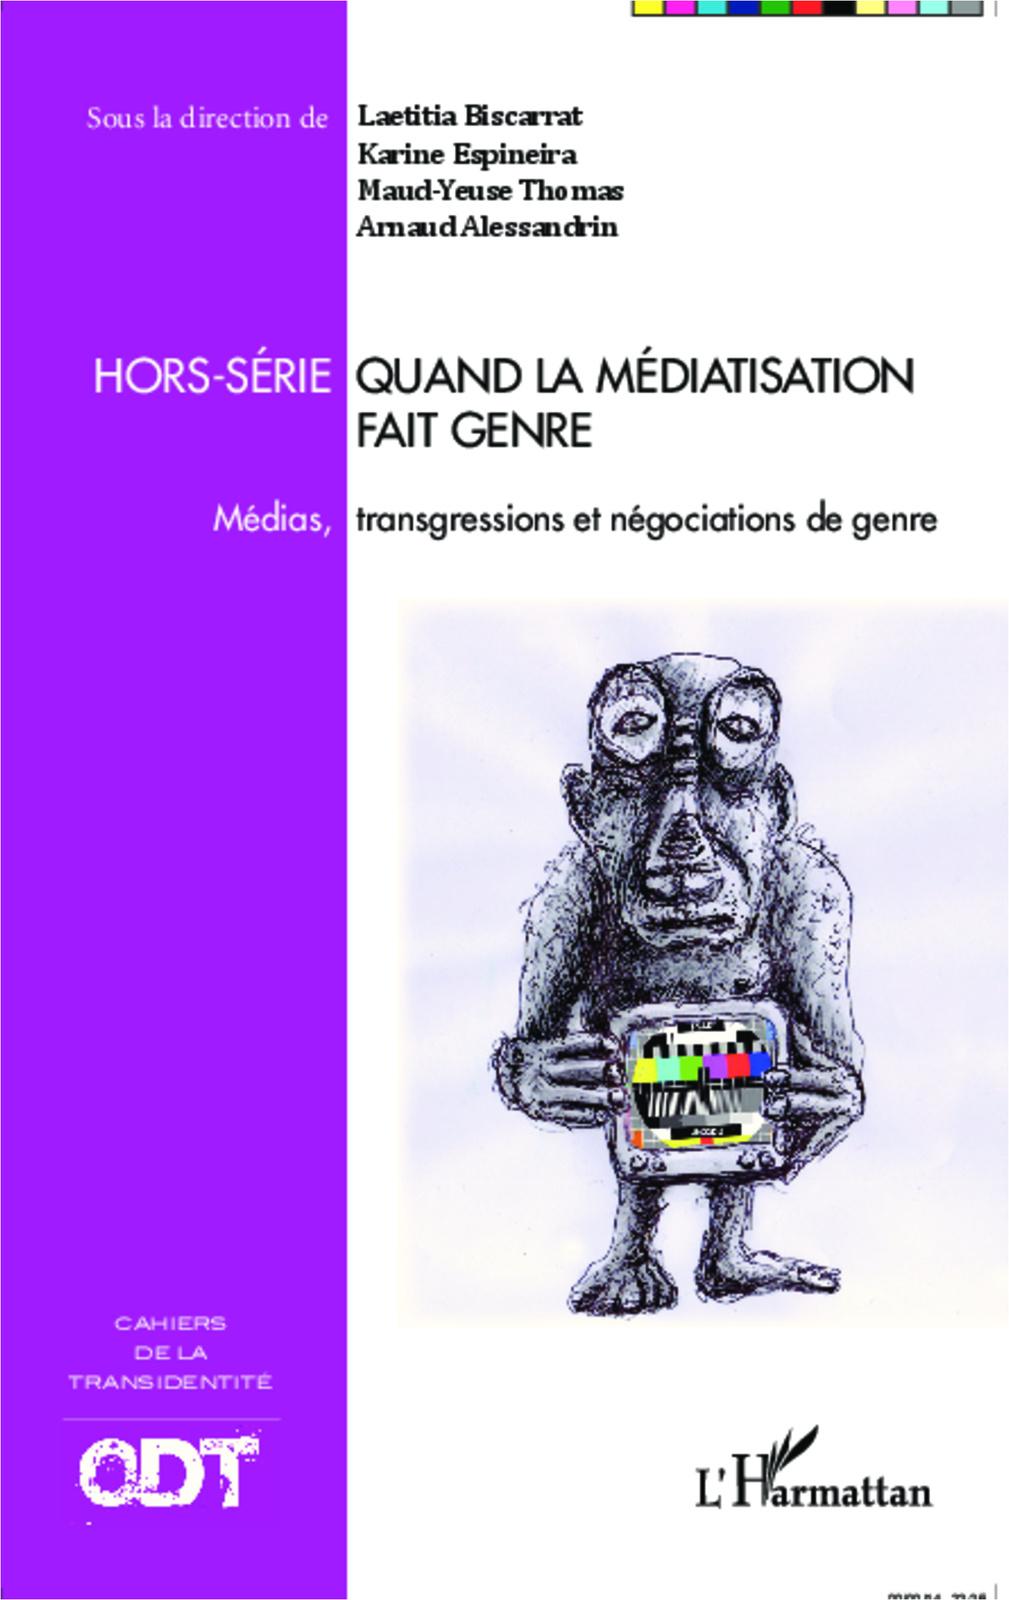 Illustration : Les médias et moi.. et moi ? (Maud-Yeuse Thomas)